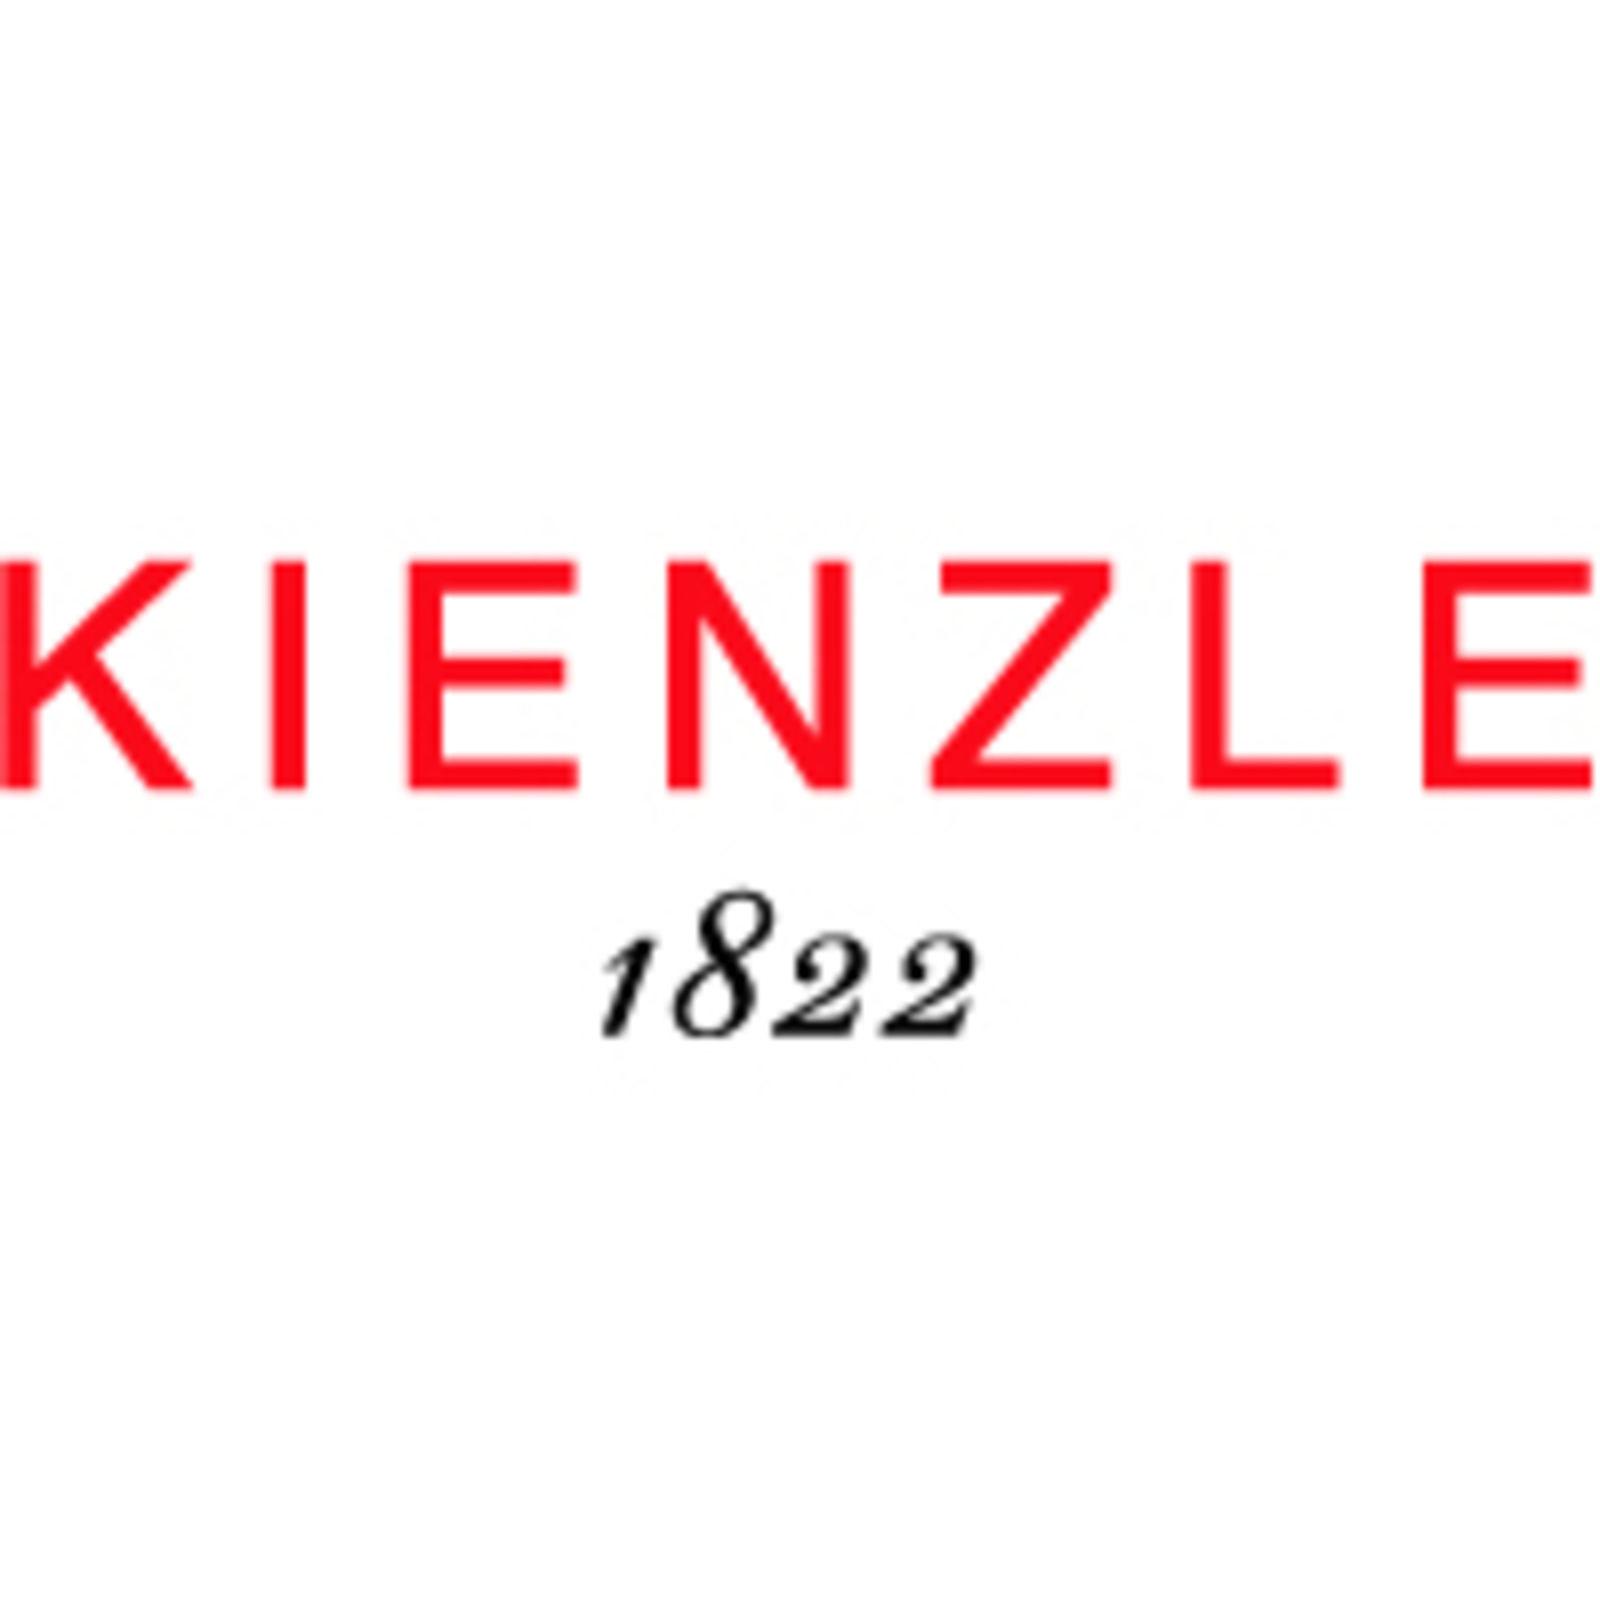 KIENZLE 1822 (Image 1)